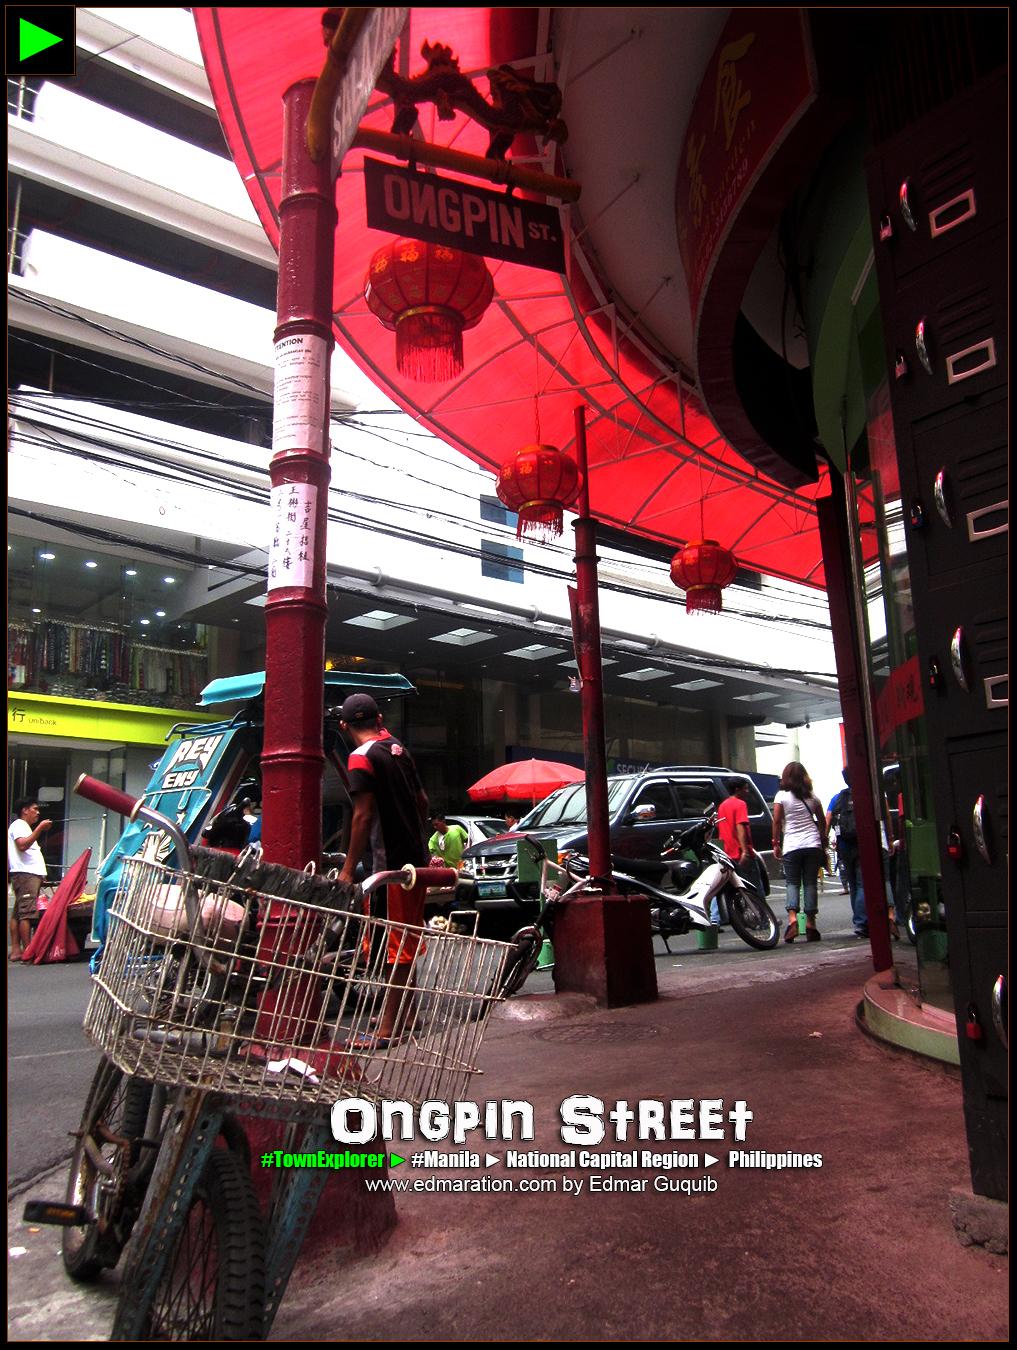 ONGPIN STREET, BINONDO